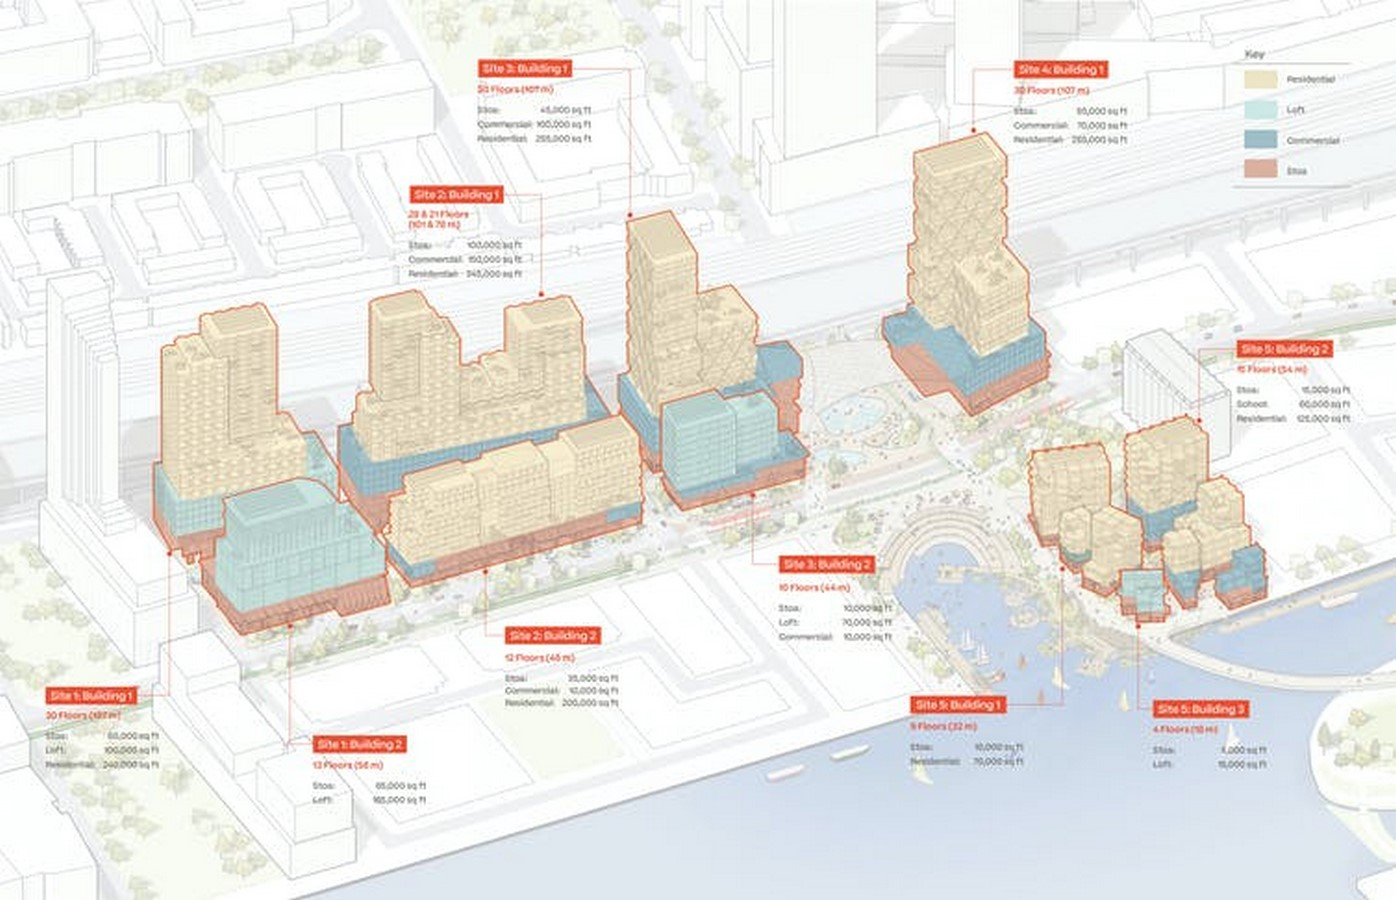 Alphabet's Sidewalk Labs by Snøhetta and Thomas Heatherwick: Mass-timber city - Sheet5